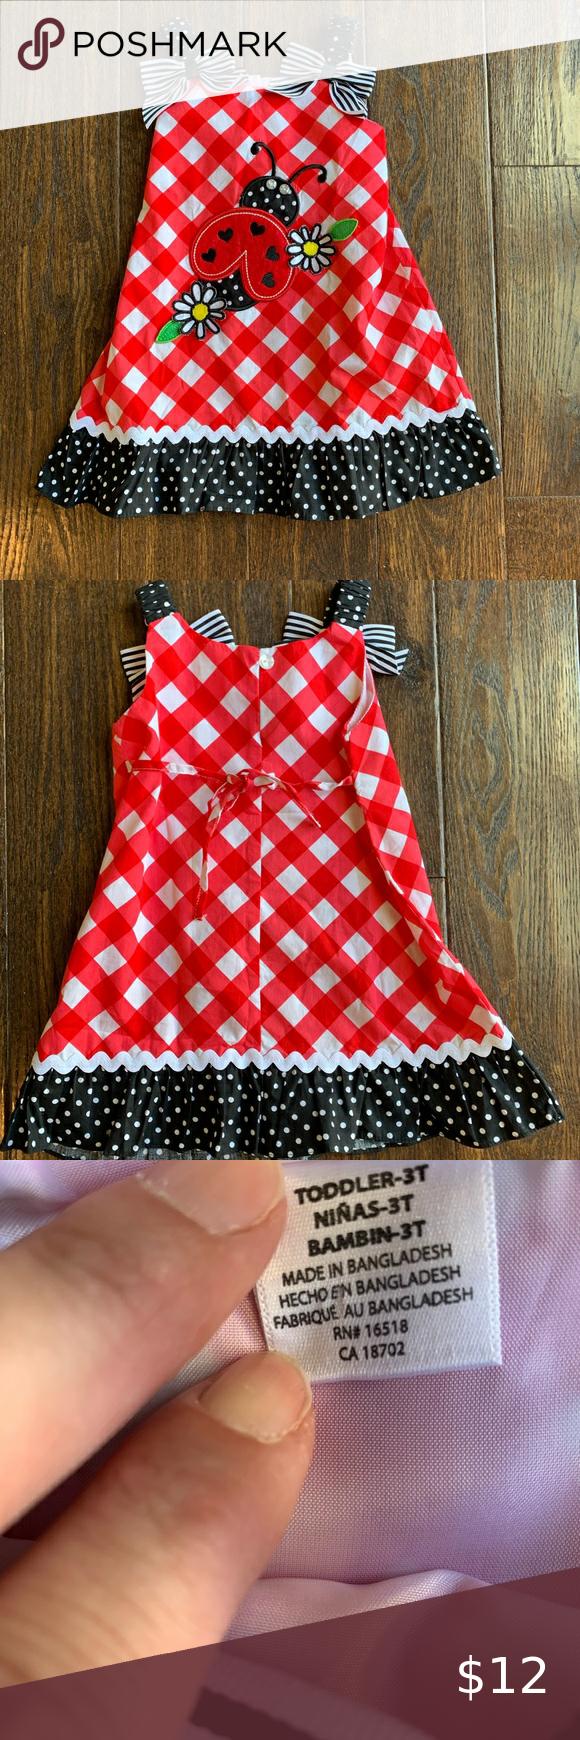 Adorable Youngland Ladybug Dress 3t Ladybug Dress Cute Summer Dresses 3t Dress [ 1740 x 580 Pixel ]